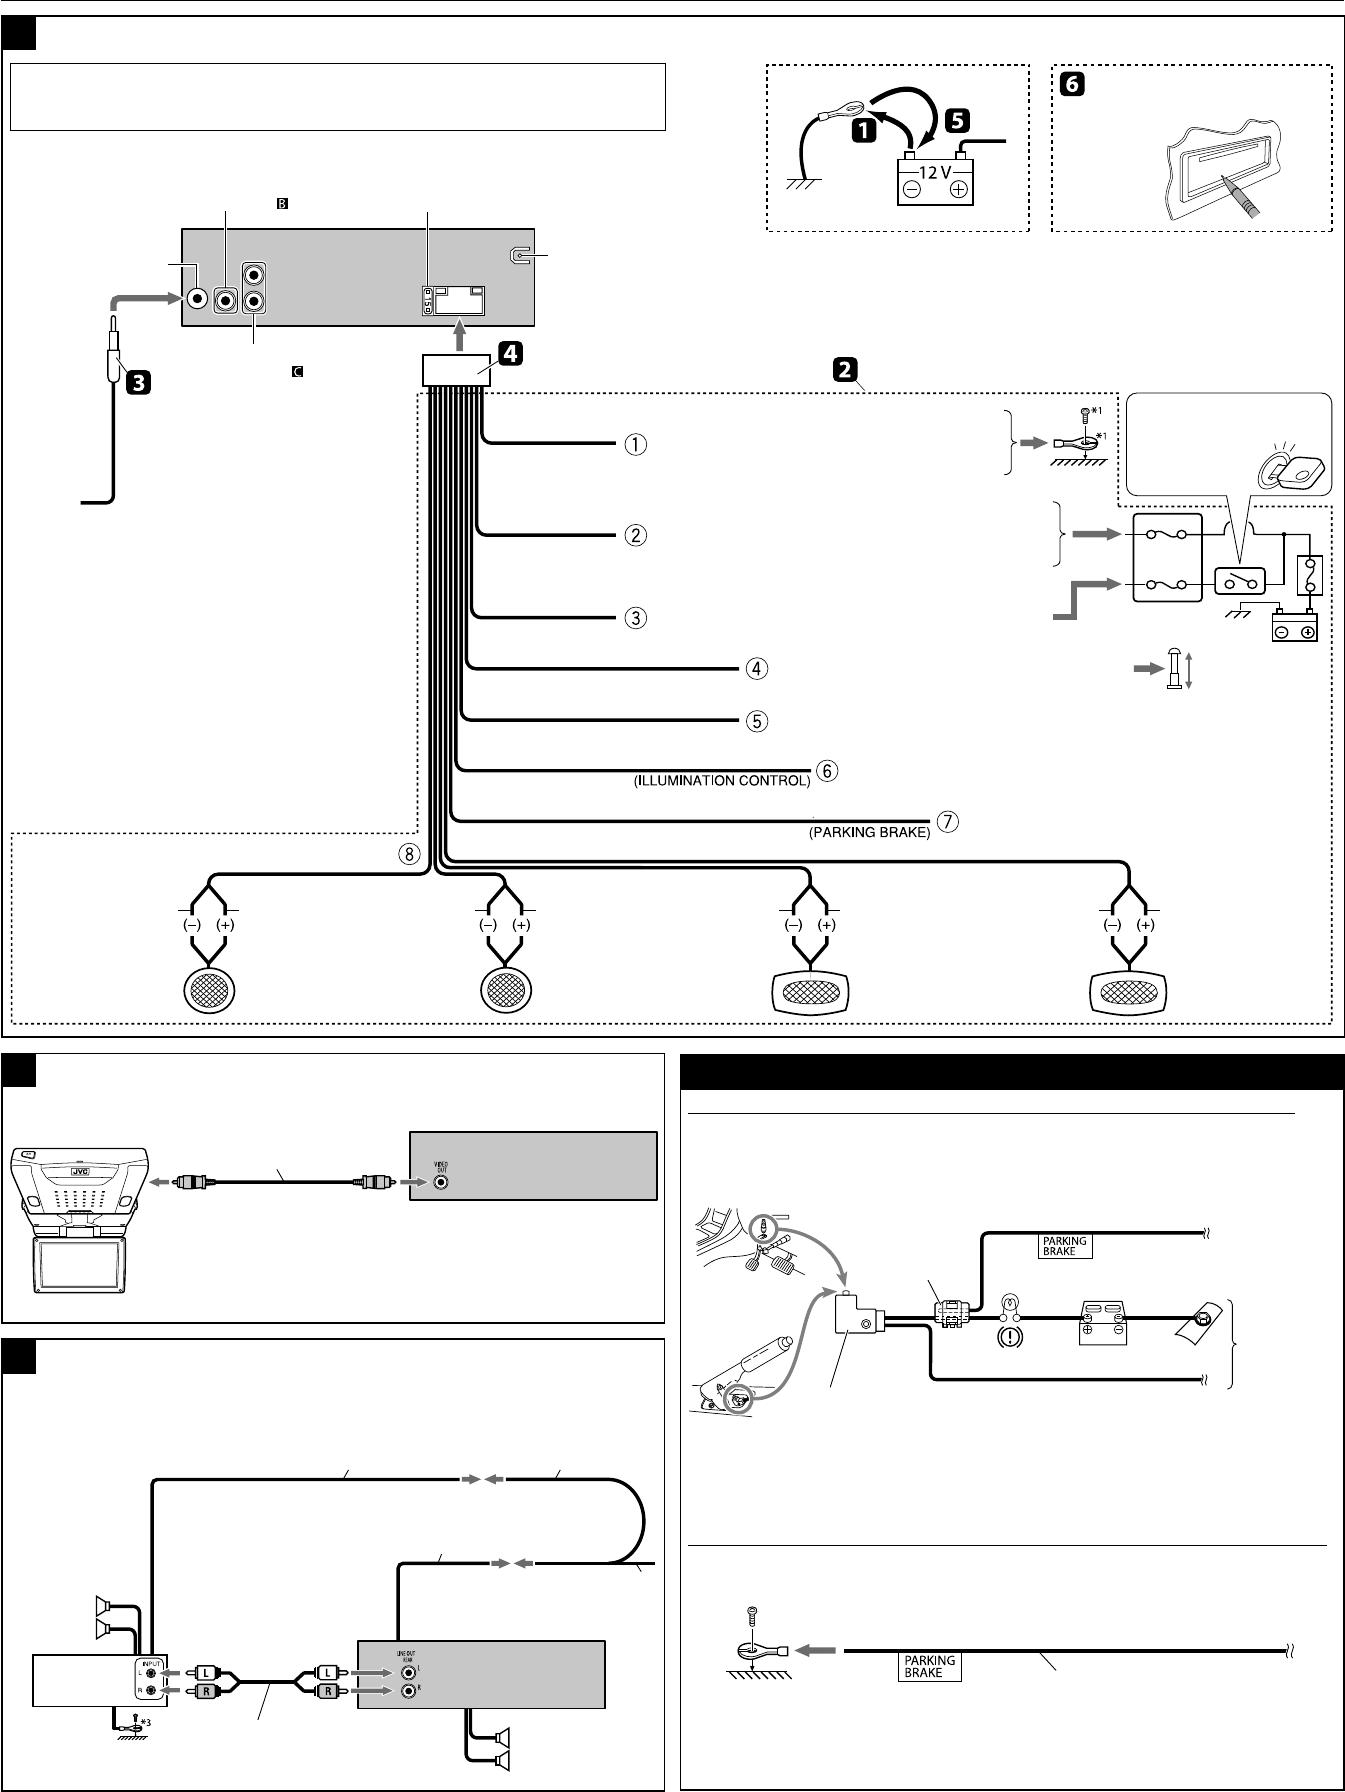 Jvc Kdx 200 Wiring Diagram - Wiring Diagram